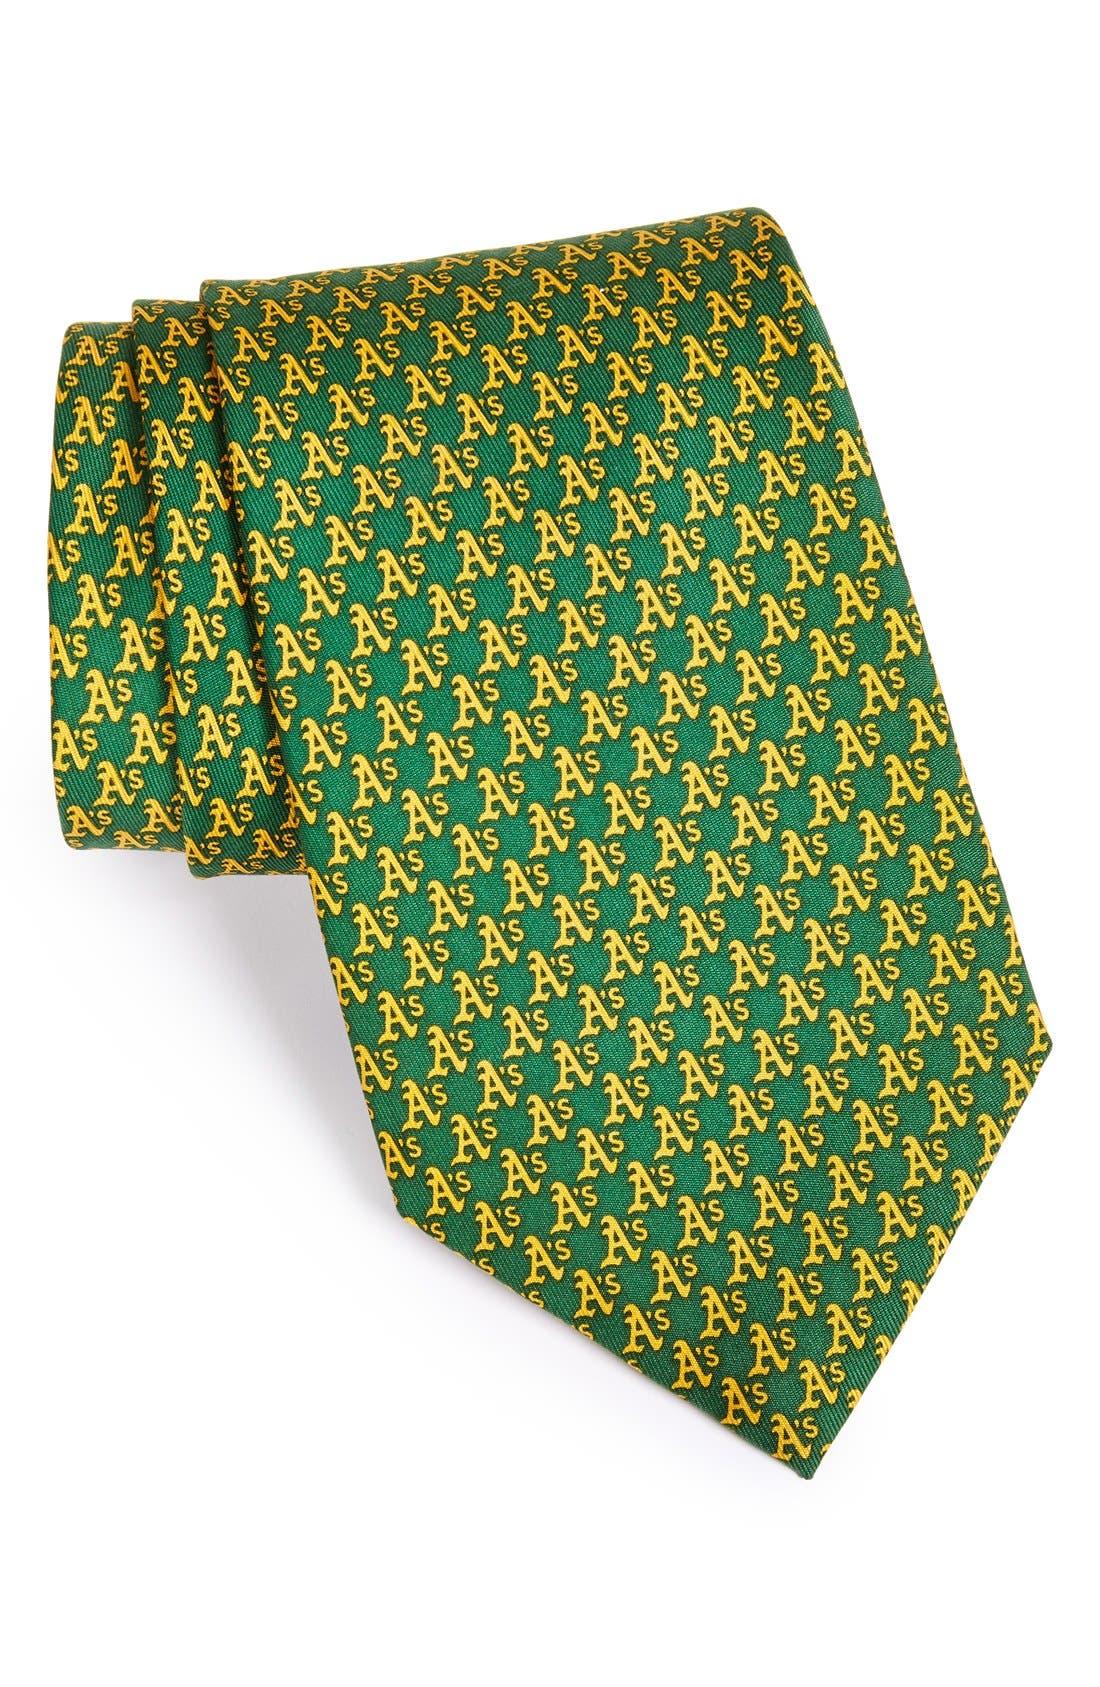 Oakland Athletics - MLB Woven Silk Tie,                             Main thumbnail 1, color,                             GREEN